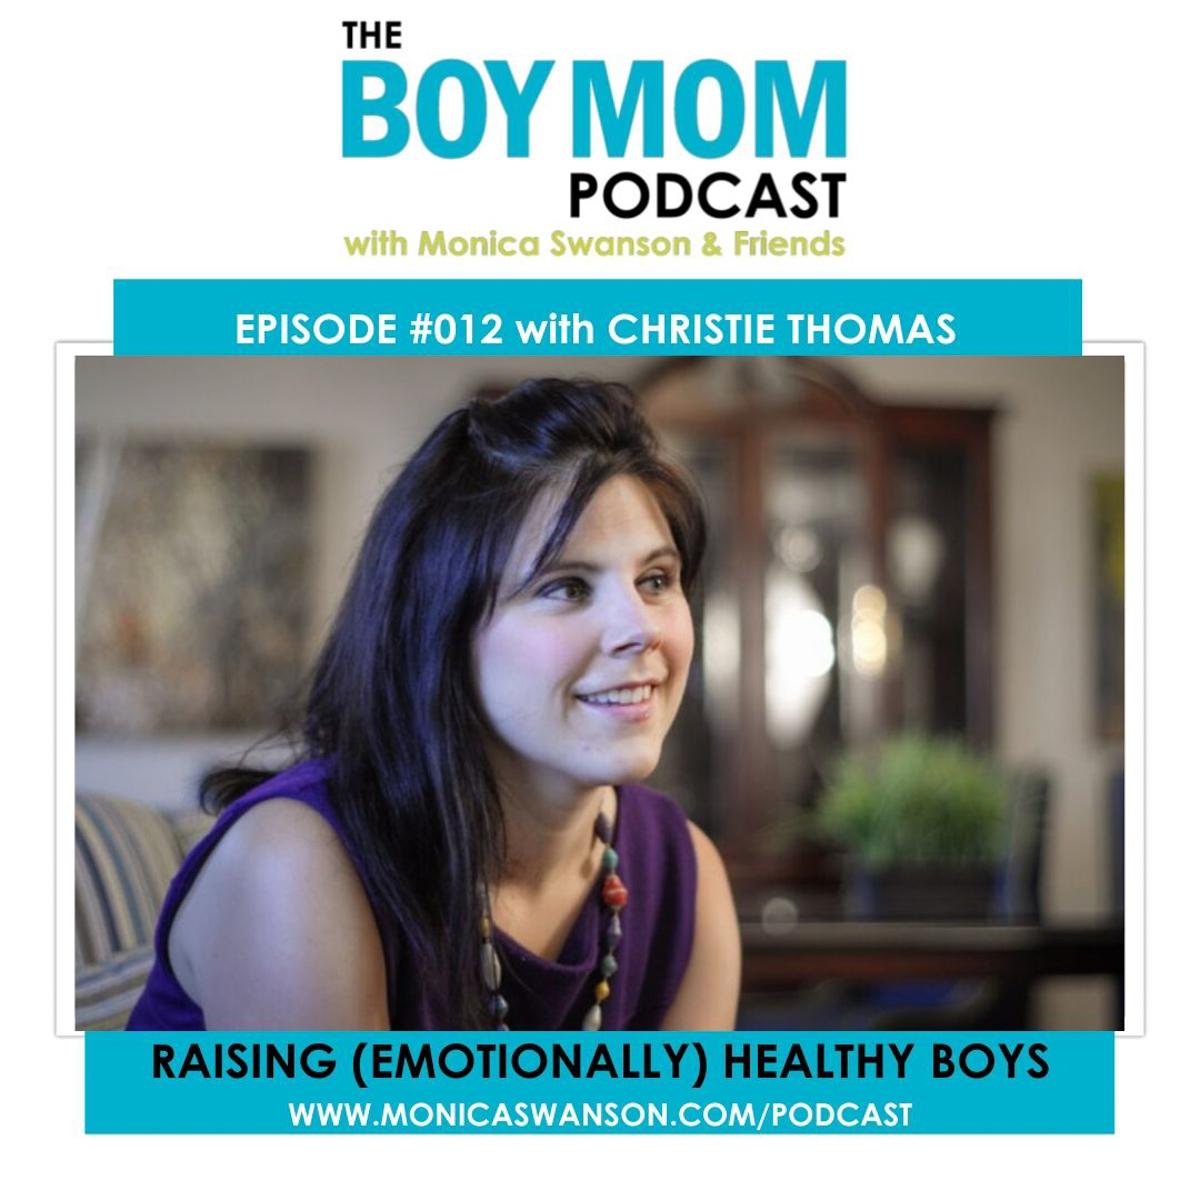 Raising (Emotionally) Healthy Boys {Podcast Episode 012 with Christie Thomas}